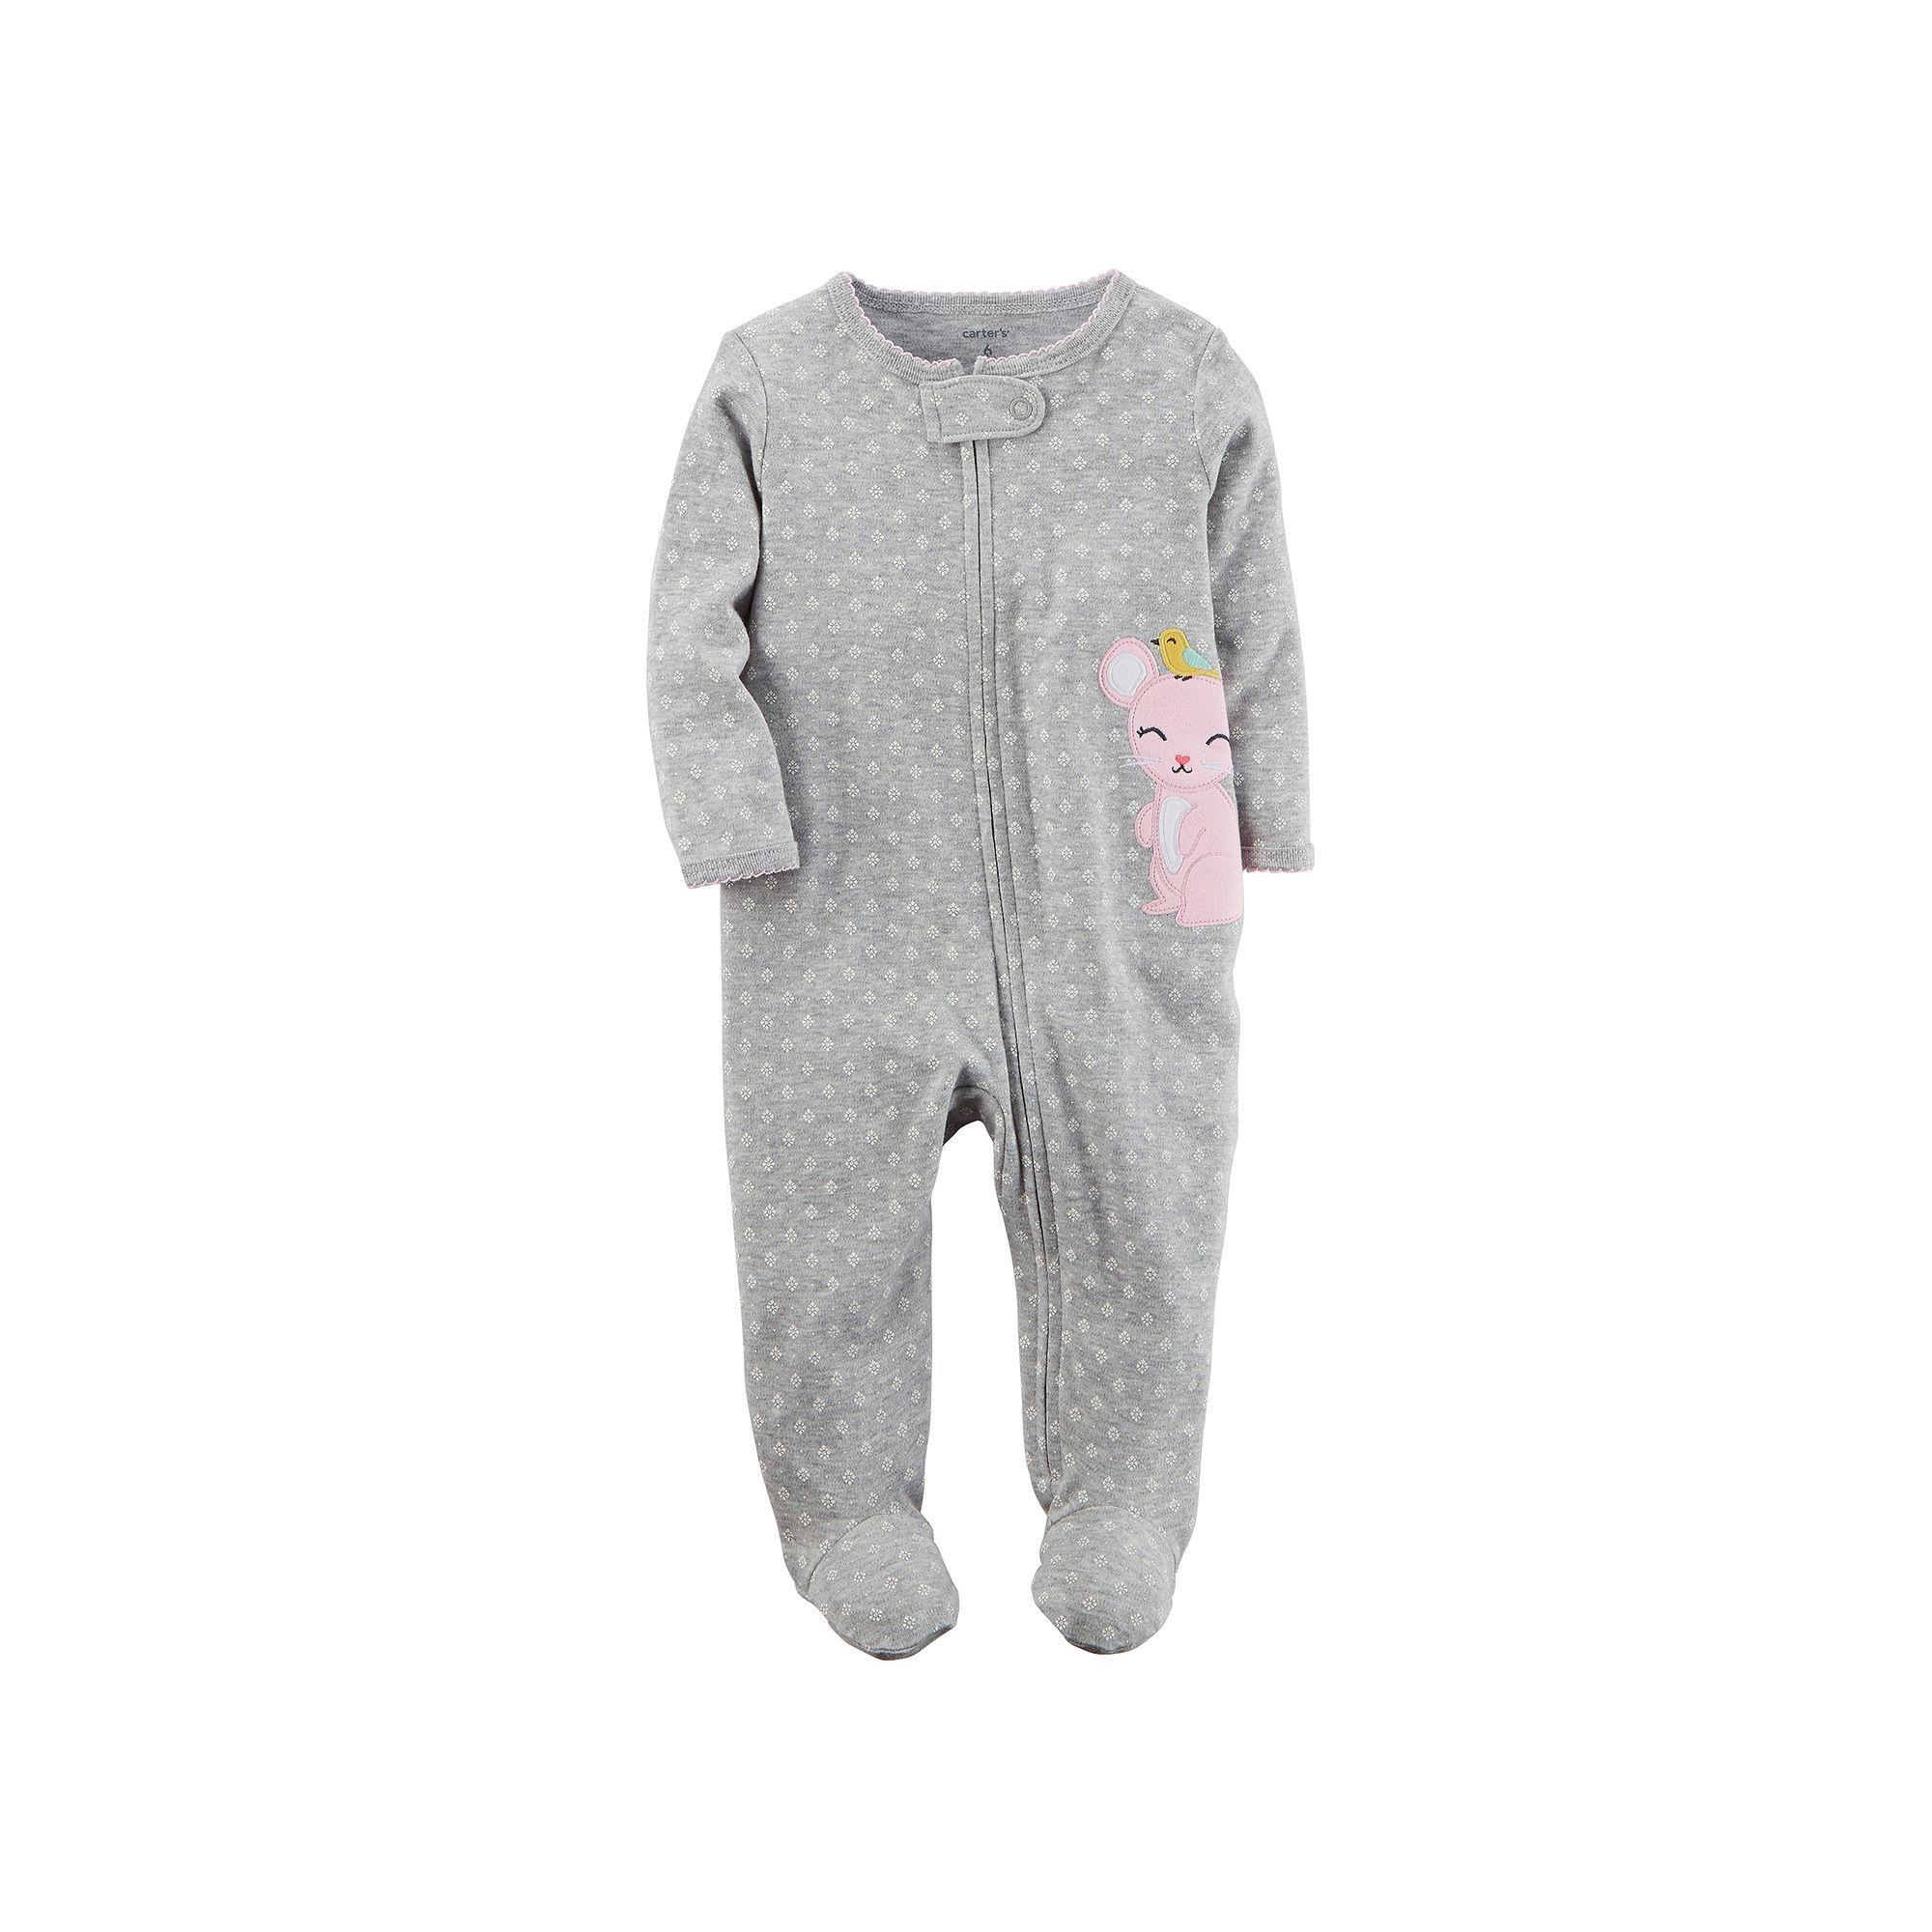 5e72fcc674ce Carter s Baby Girl Embroidered Sleep   Play